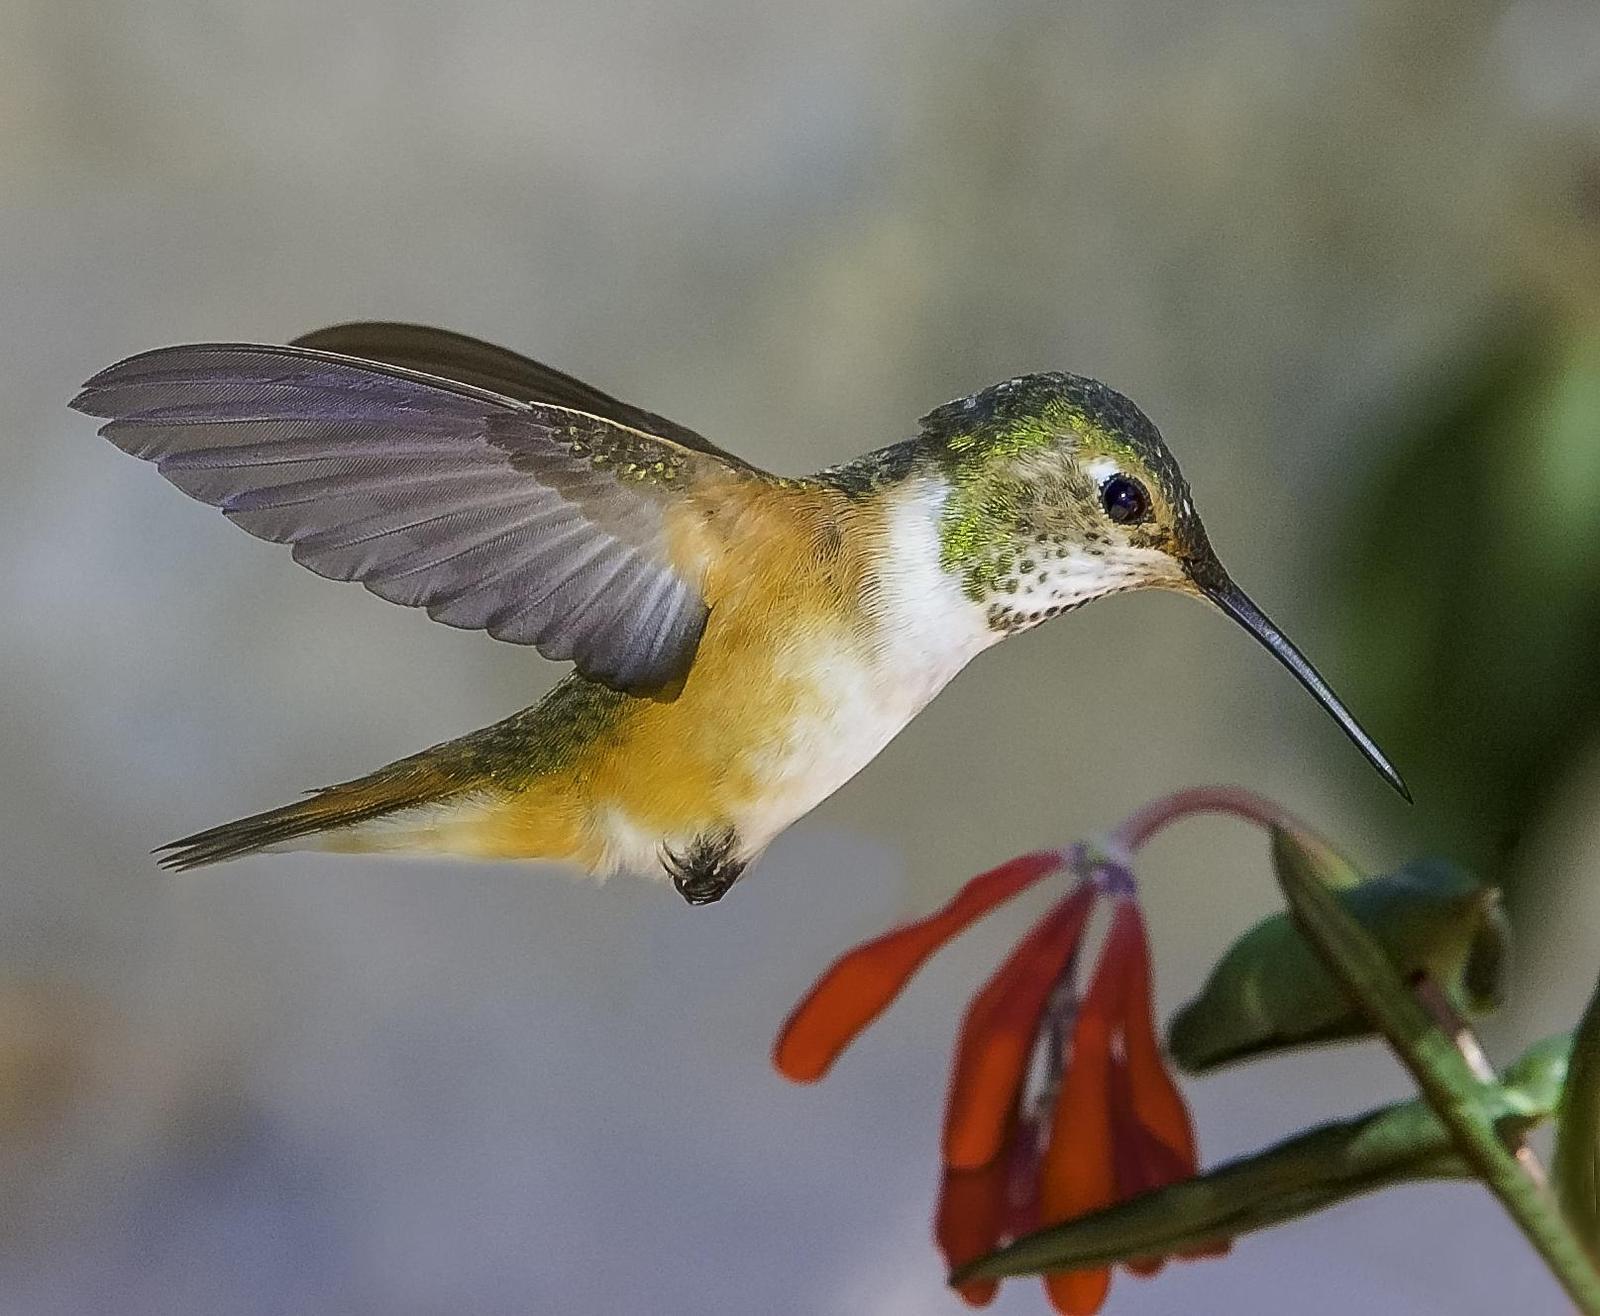 Broad-tailed Hummingbird Photo by Mason Rose